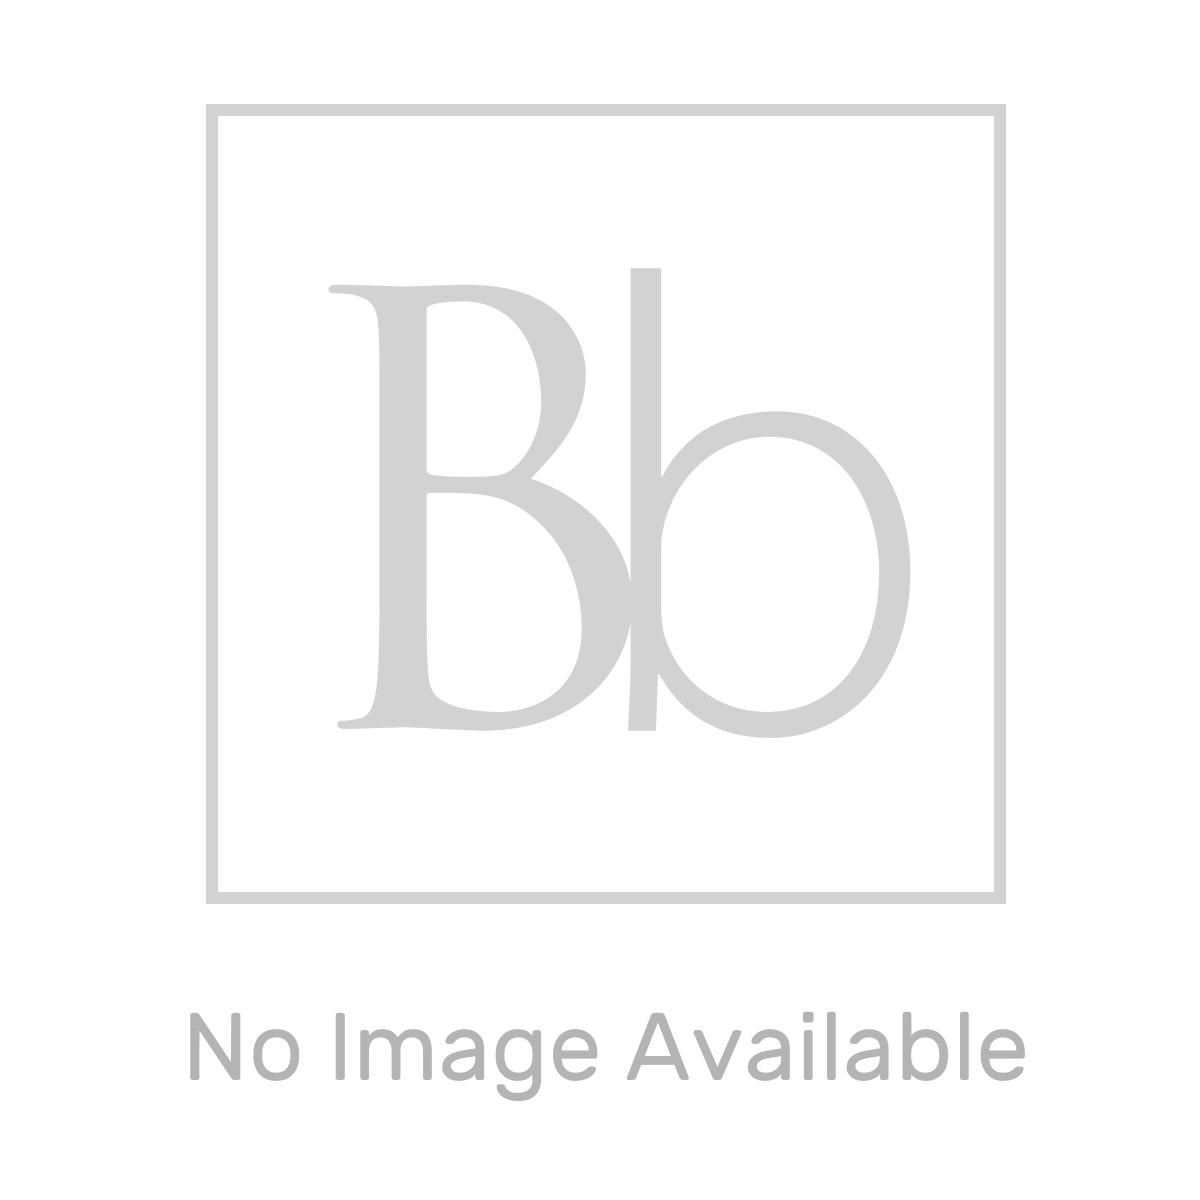 RAK Compact Close Coupled Toilet Dimensions